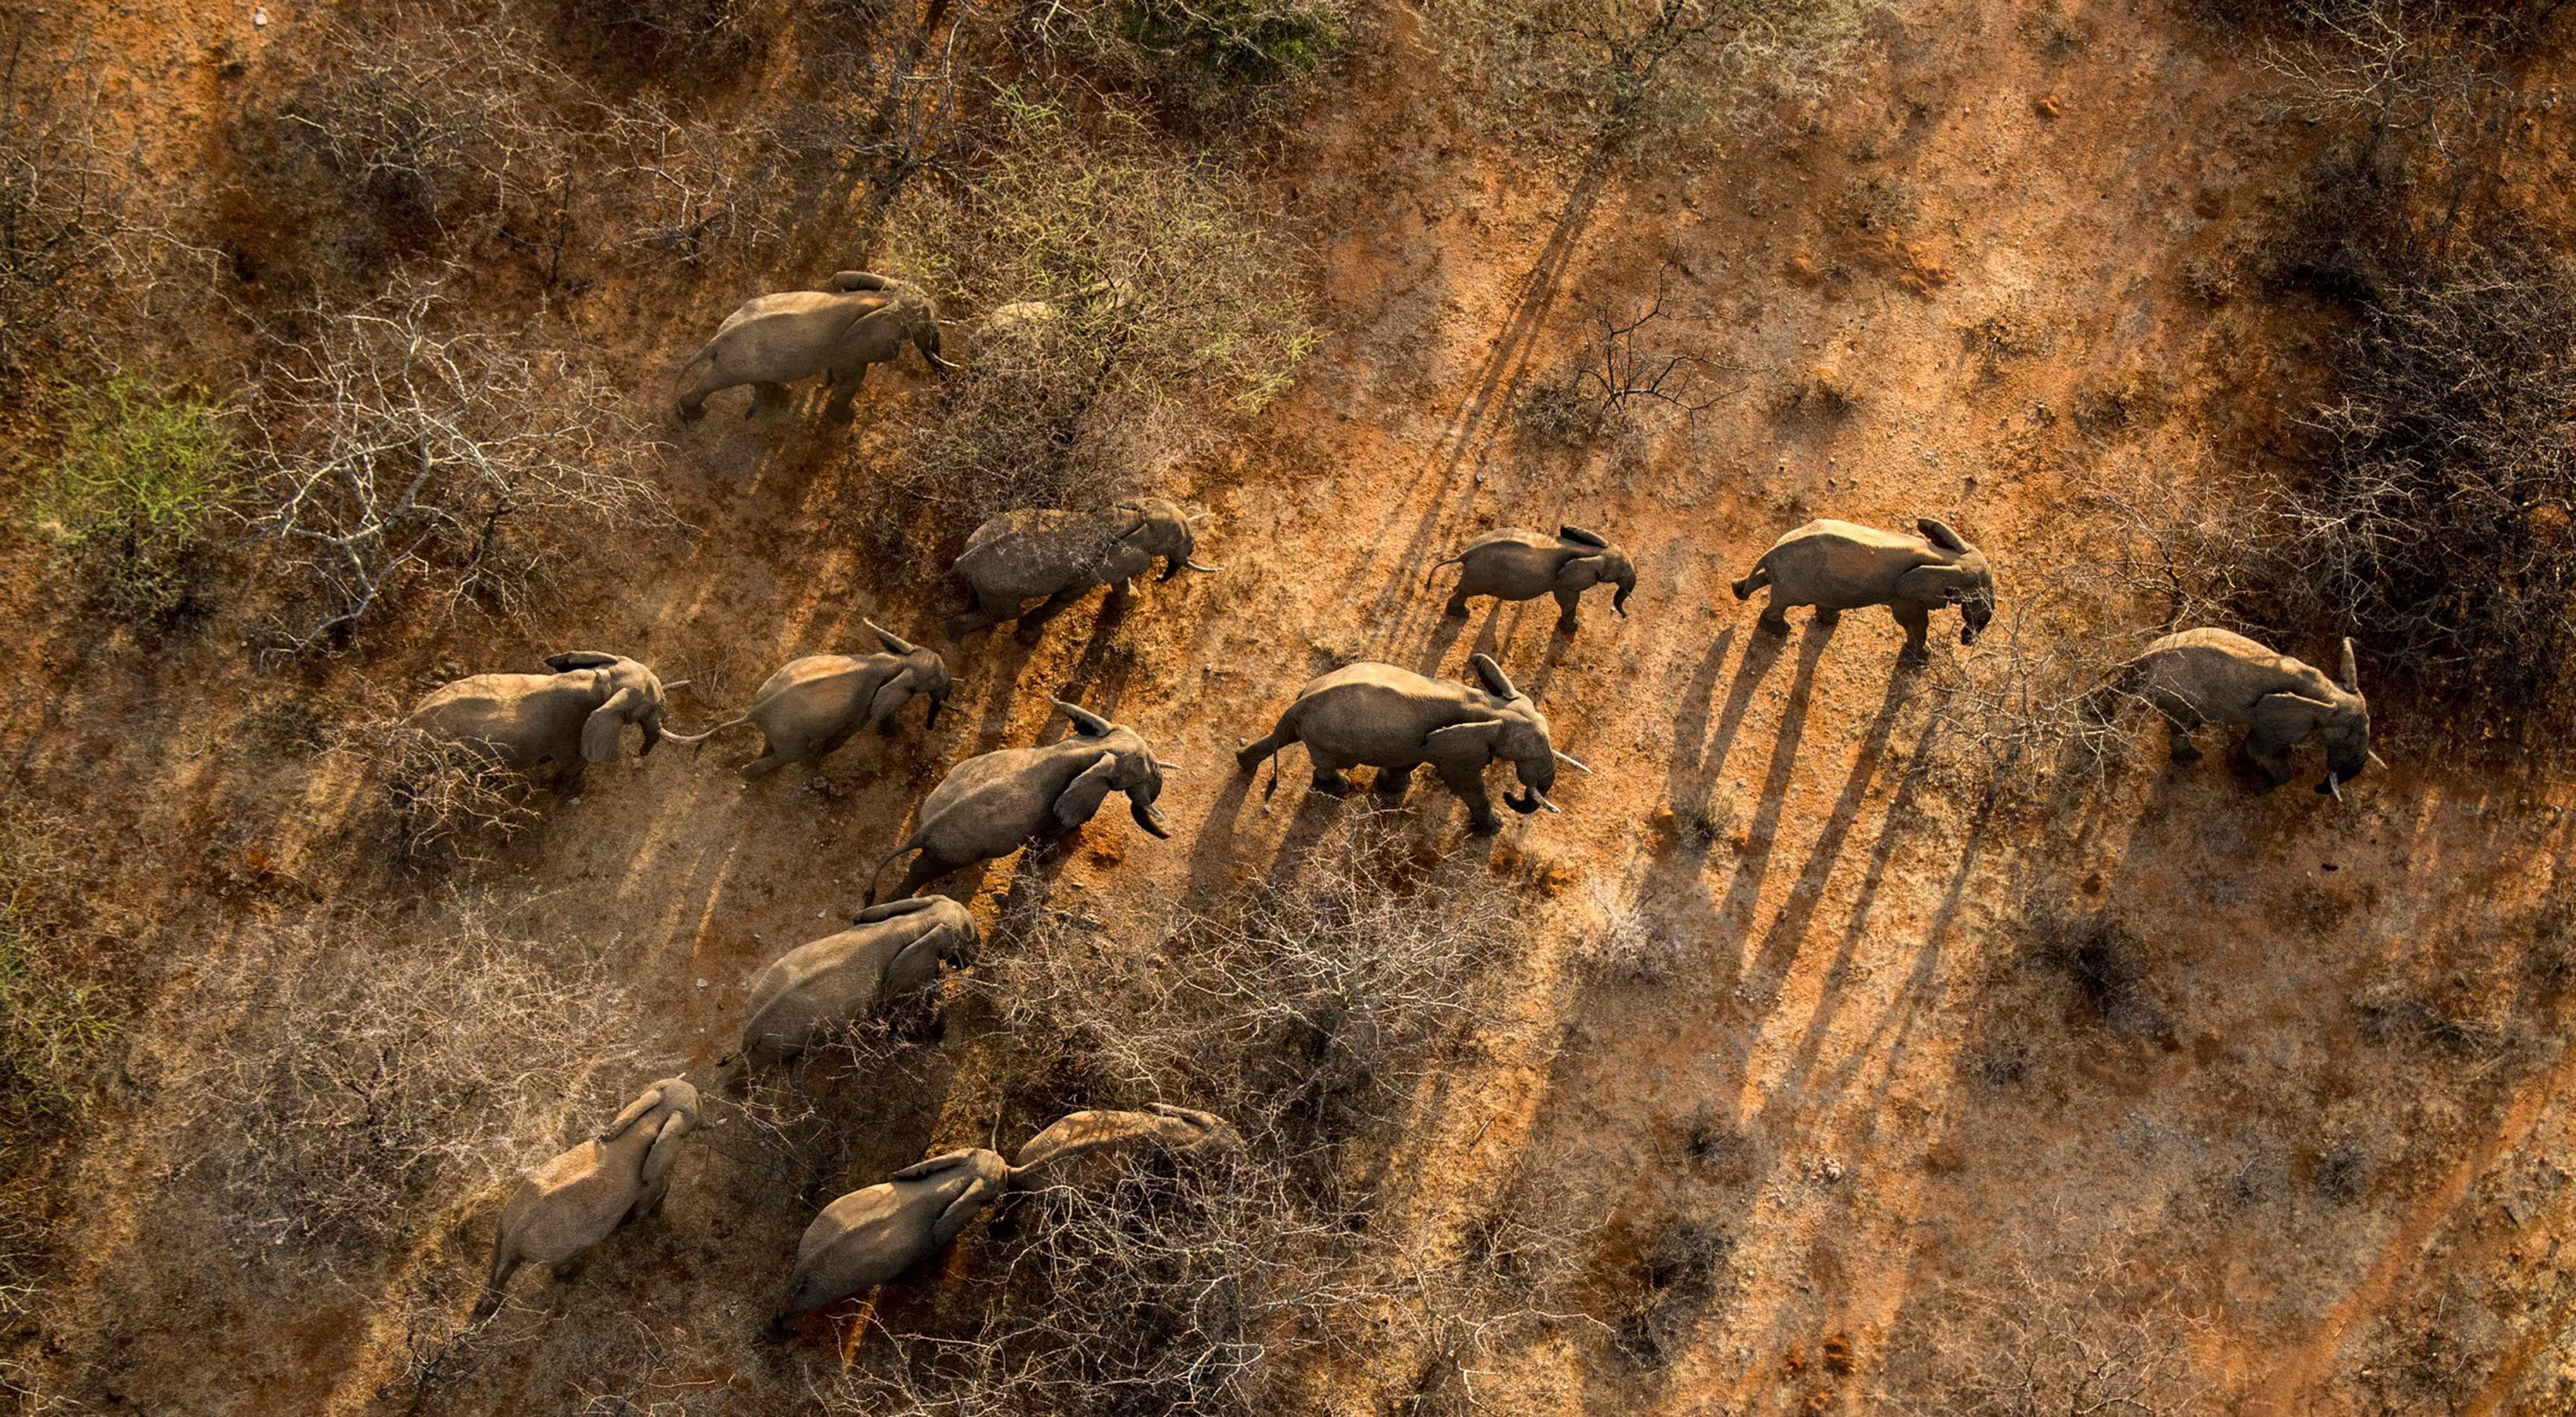 Elephants in the Namunyak Wildlife Conservancy in northern Kenya's Matthews Range.